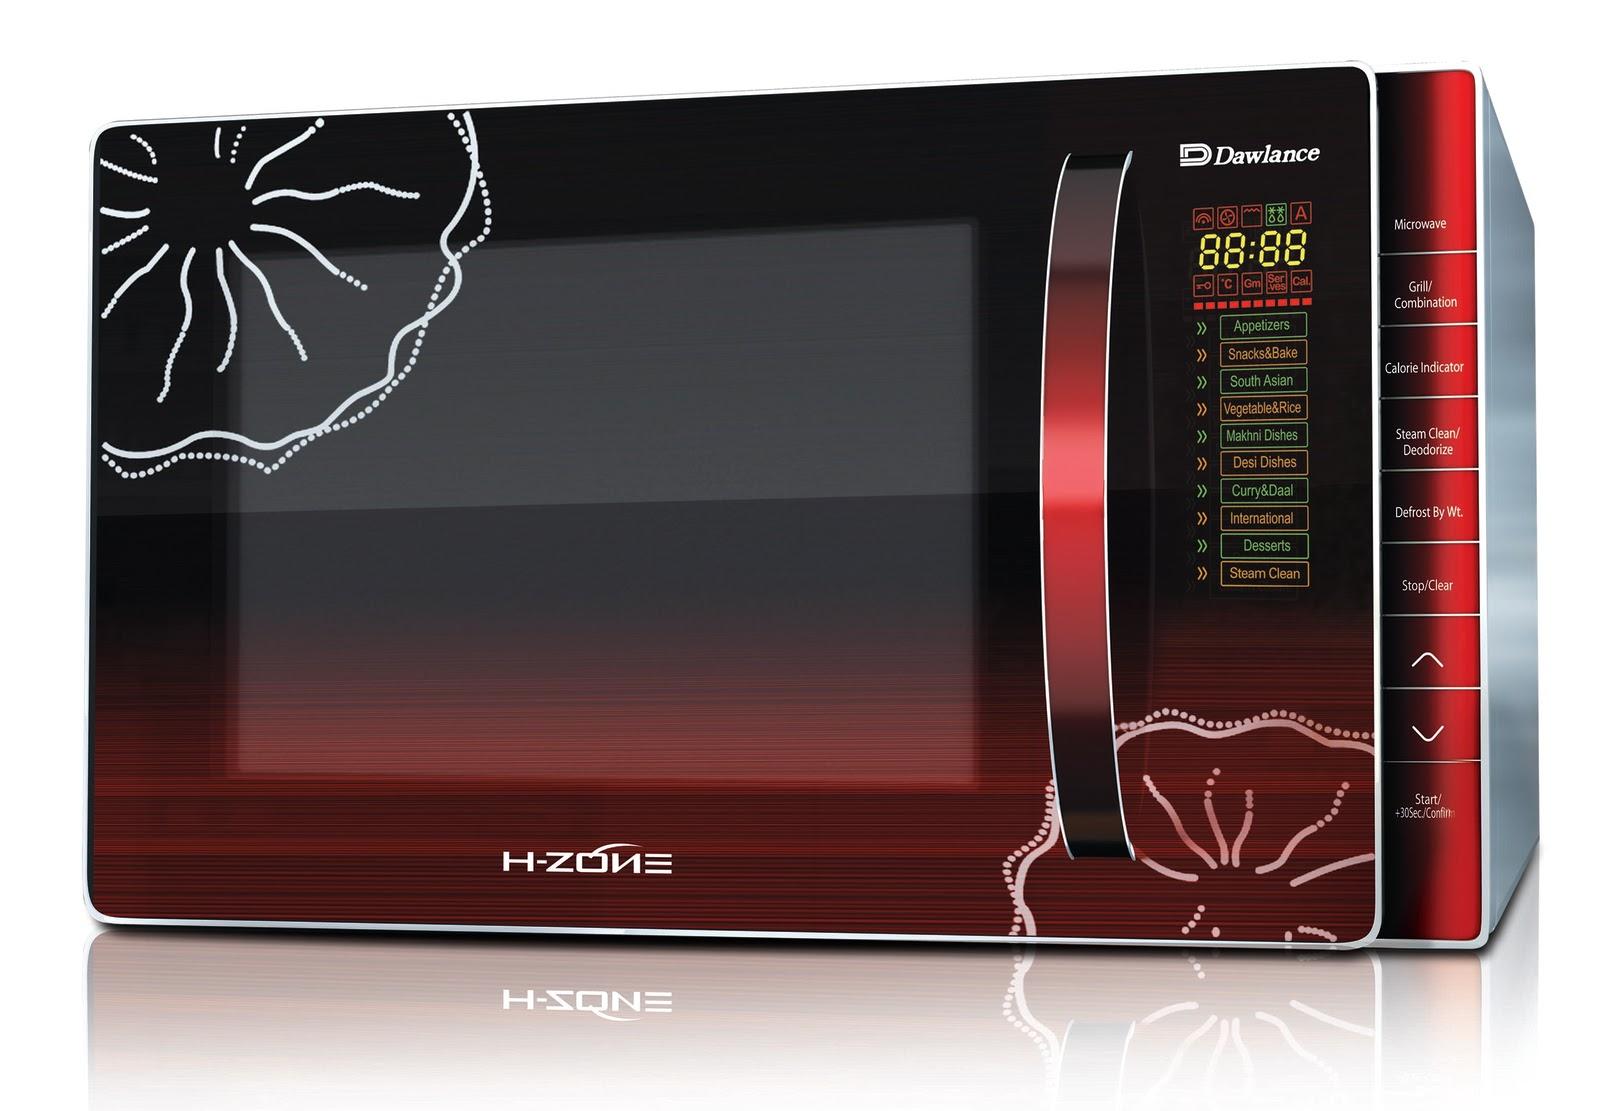 Technology Pak Dawlance Introduces Dw115 Chz Microwave Oven